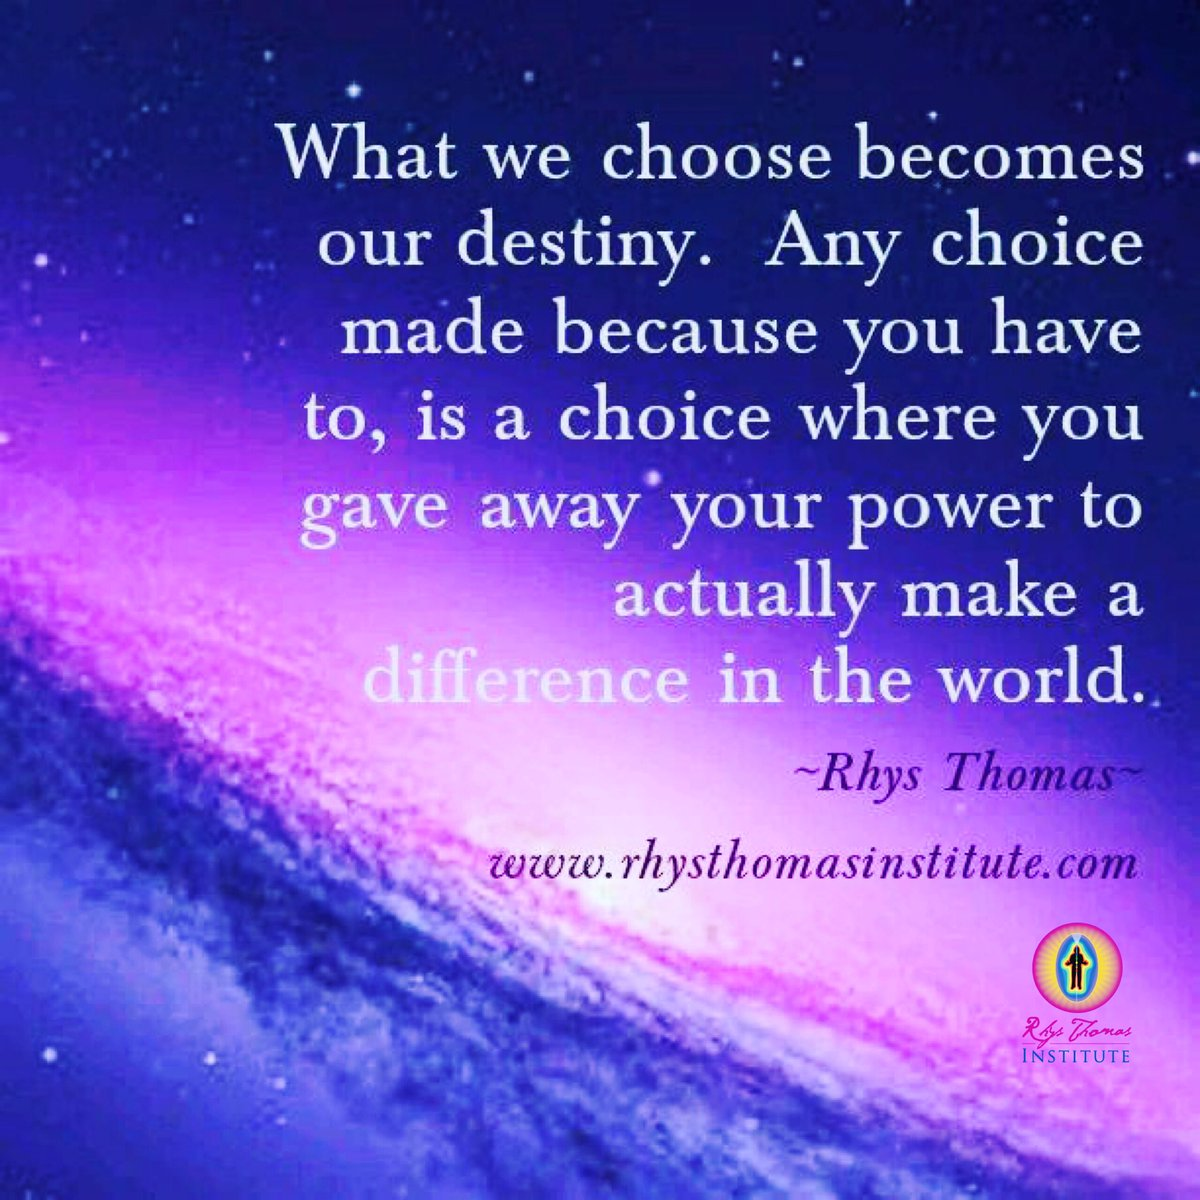 #destiny #choices #power #love #makeadifference #spiritualawakening #liveyourbestlife #energyhealing #sundayvibes #SundayThoughts